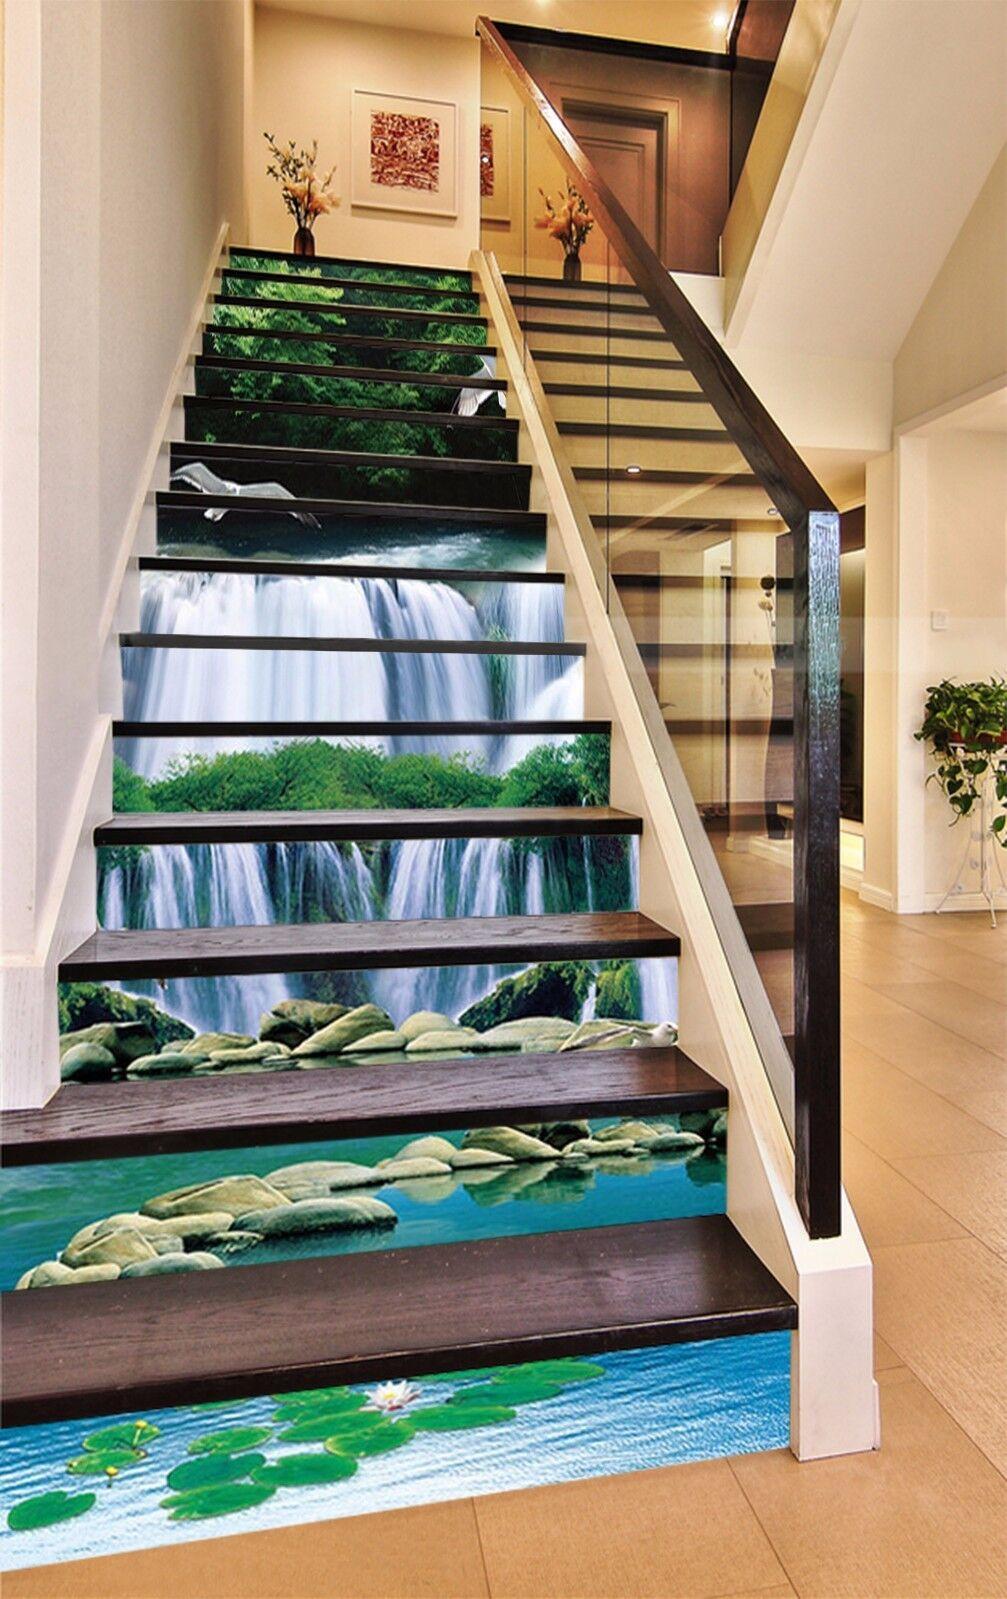 3D Waterfall River 937 Risers Decoration Photo Mural Vinyl Decal Wallpaper CA